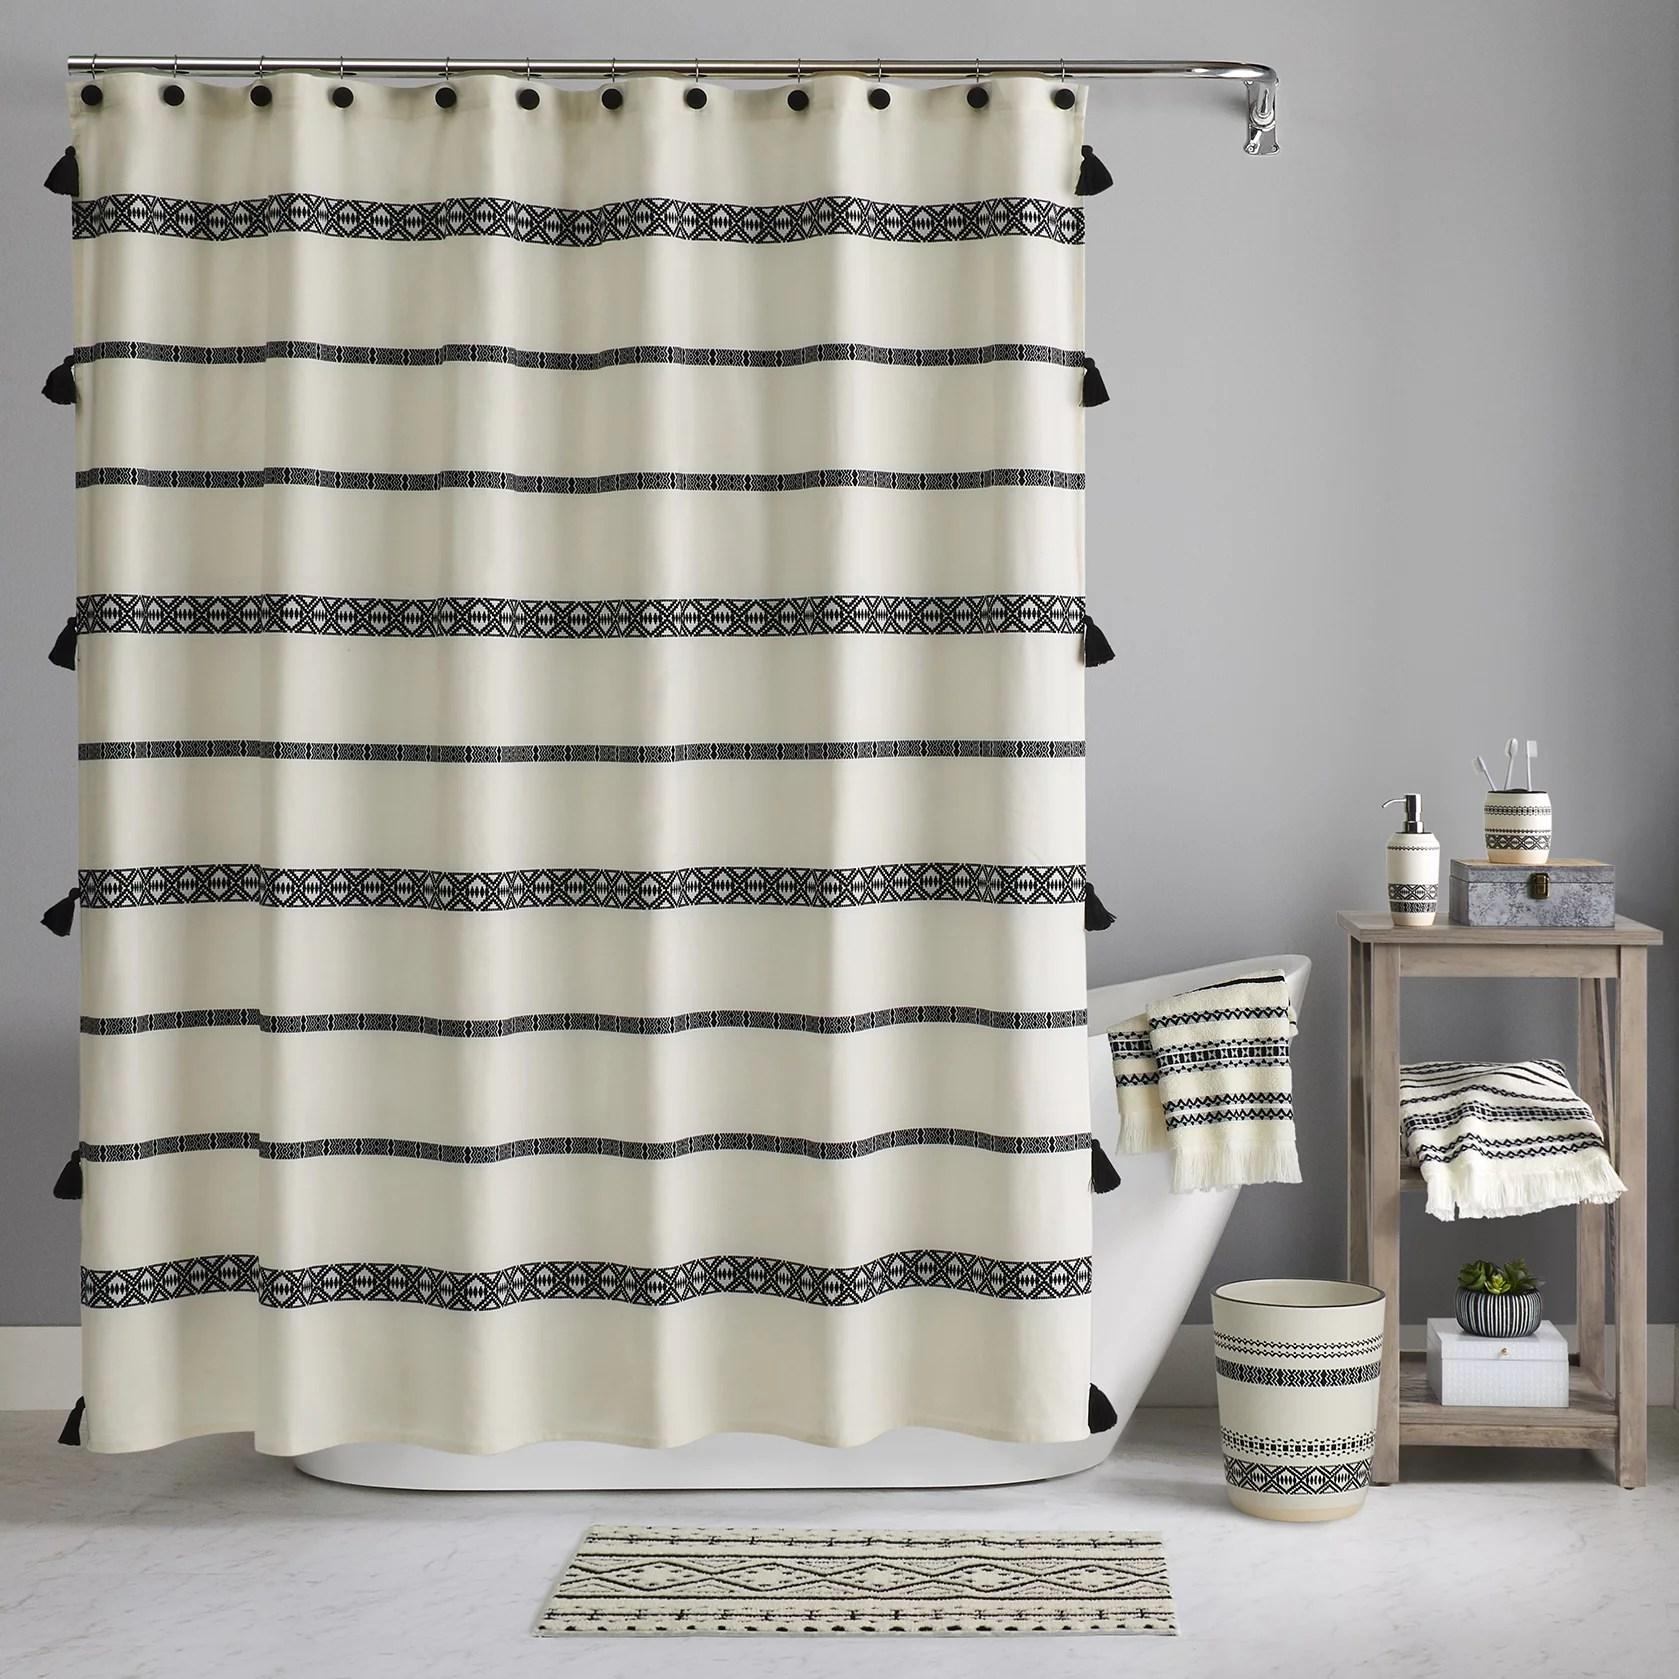 better homes gardens boho chic cotton shower curtain beige black 72 x72 walmart com